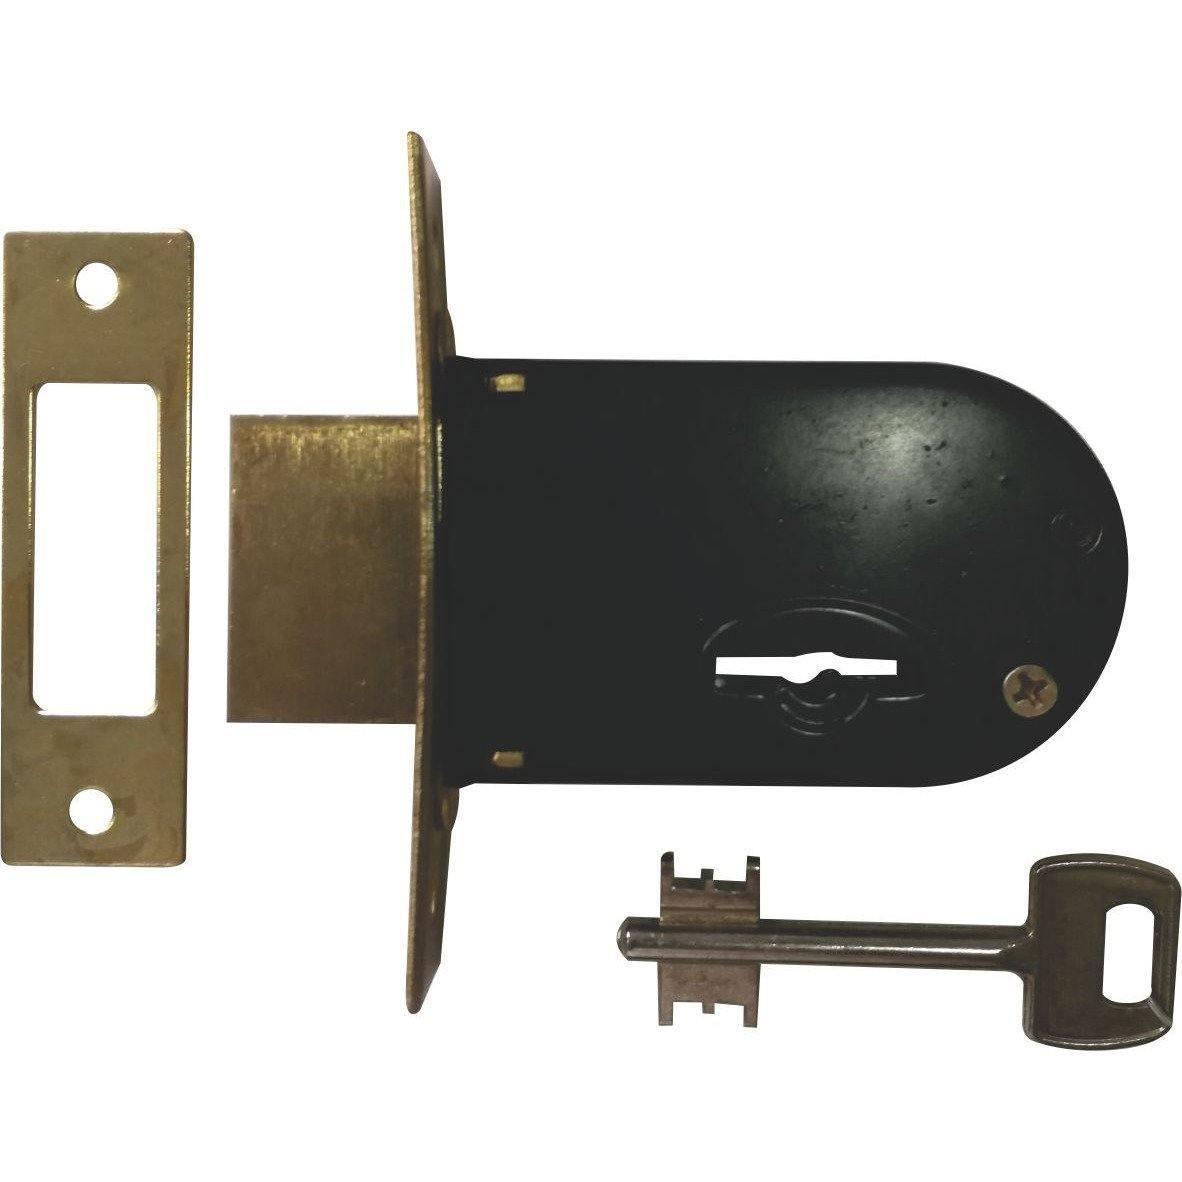 Security Gate Lock - 5 Lever